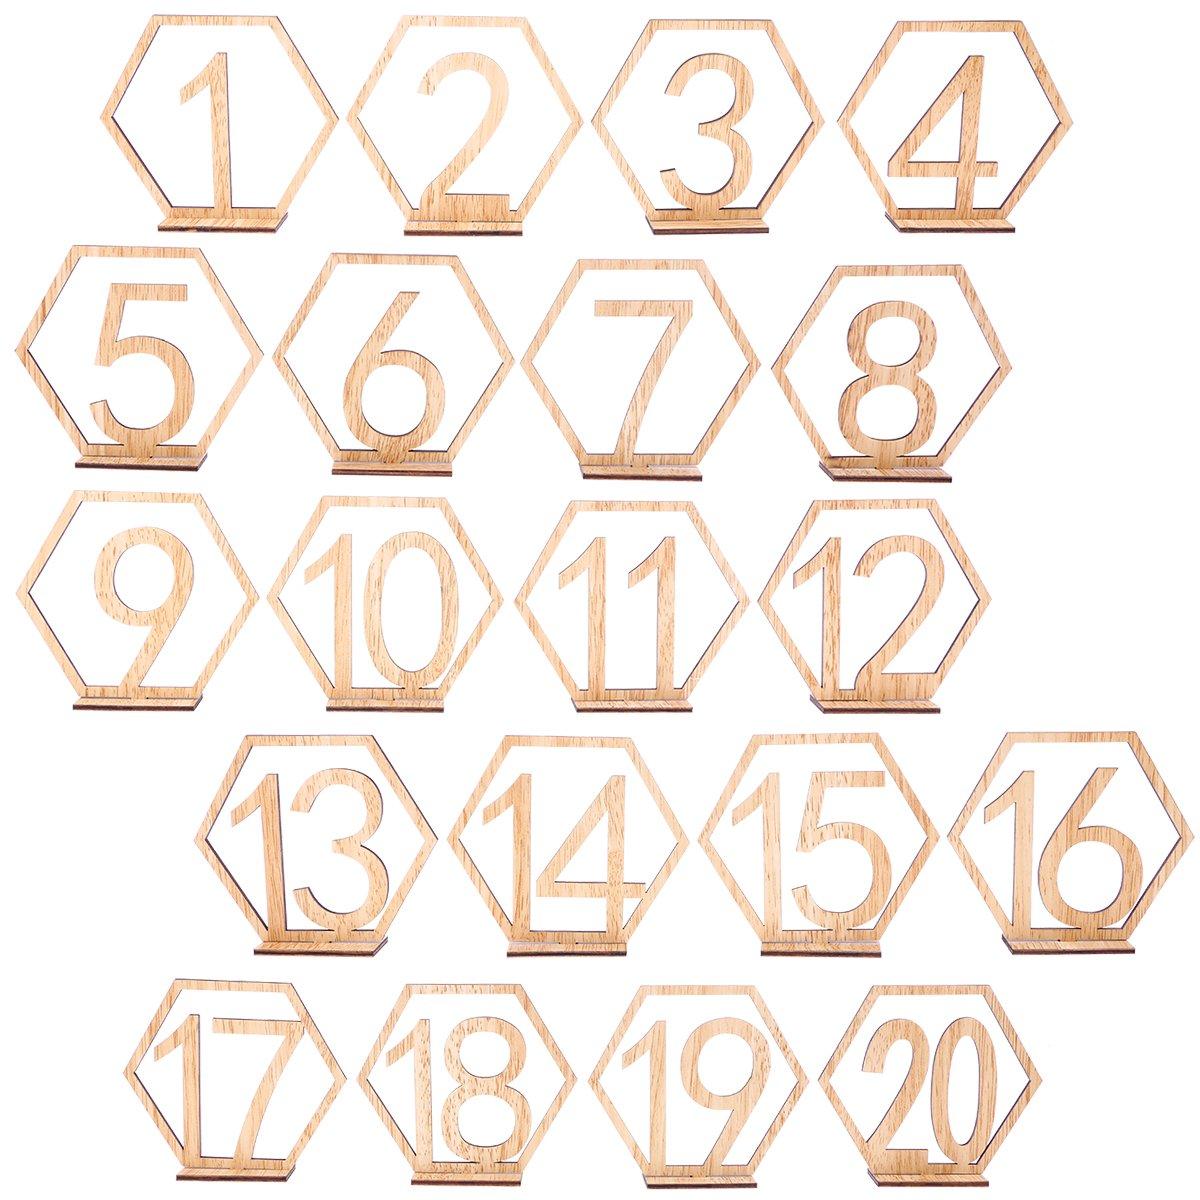 BESTOYARD 20pcs 1-20 Wooden Wedding Table Numbers with Holder Base Hexagon Table Numbers for Wedding Table Decoration